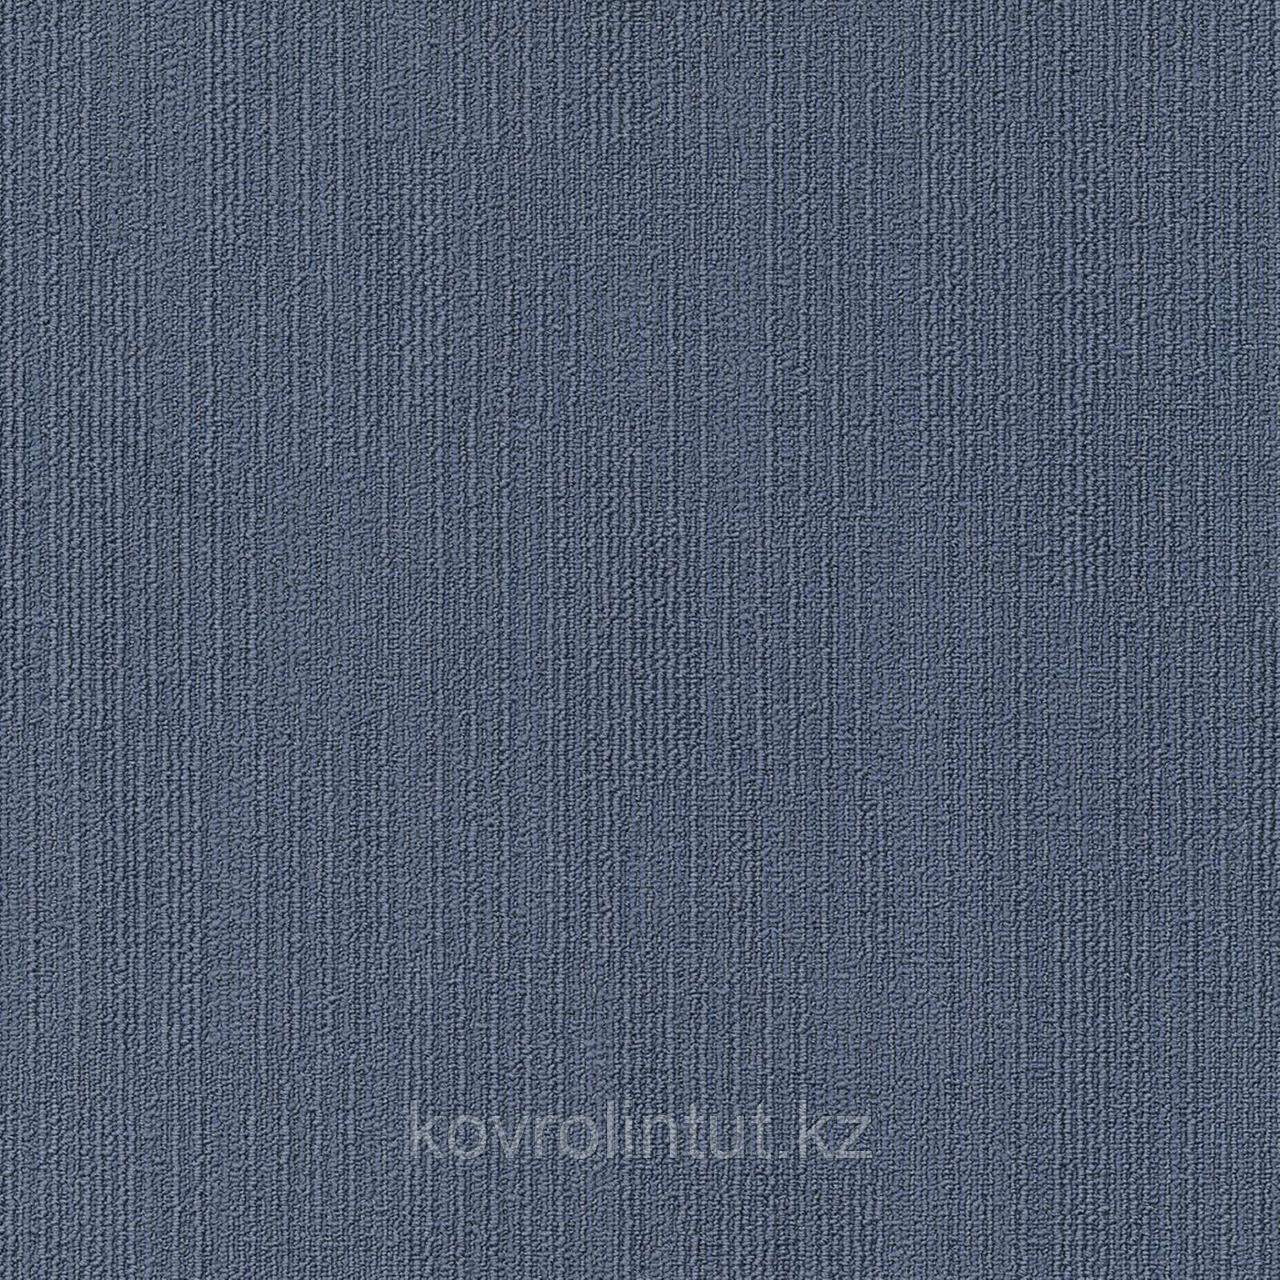 Плитка ковровая Modulyss Fashion 595, 100% PA